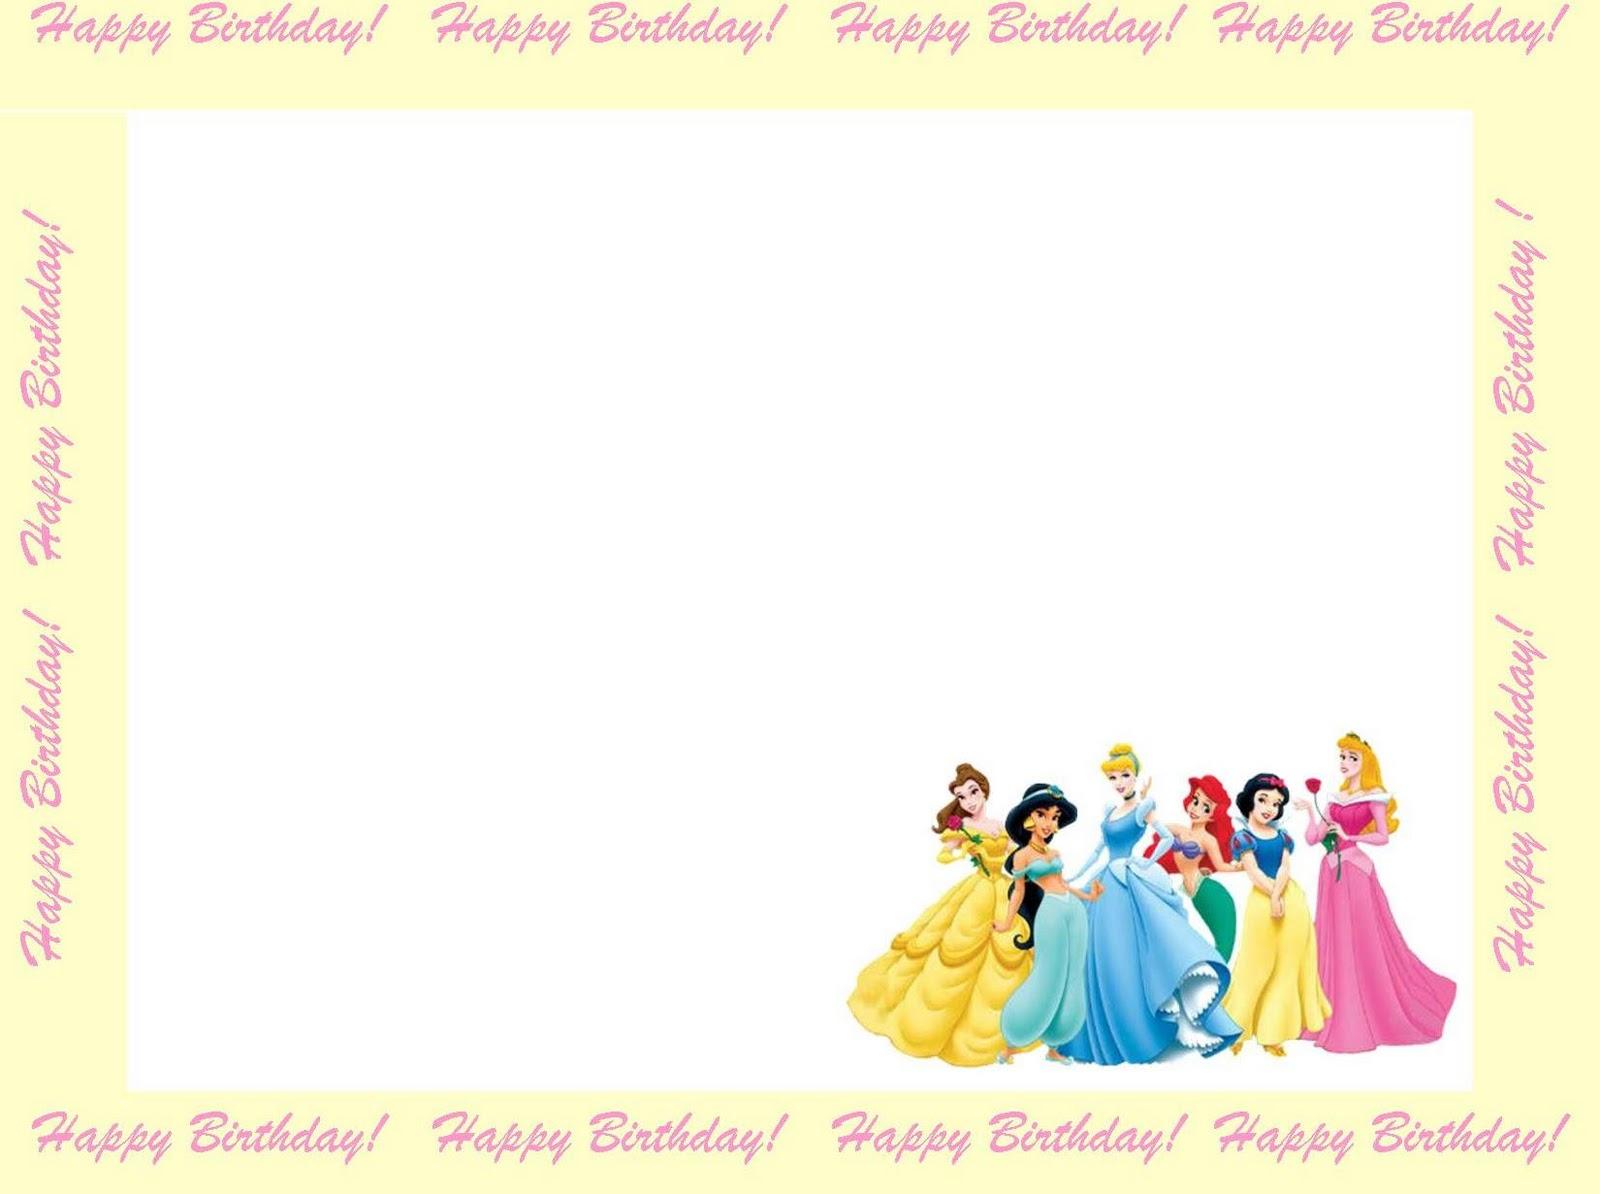 Disney Princess Birthday Invitation Free Template - Disney Princess Birthday Invitations Free Printable